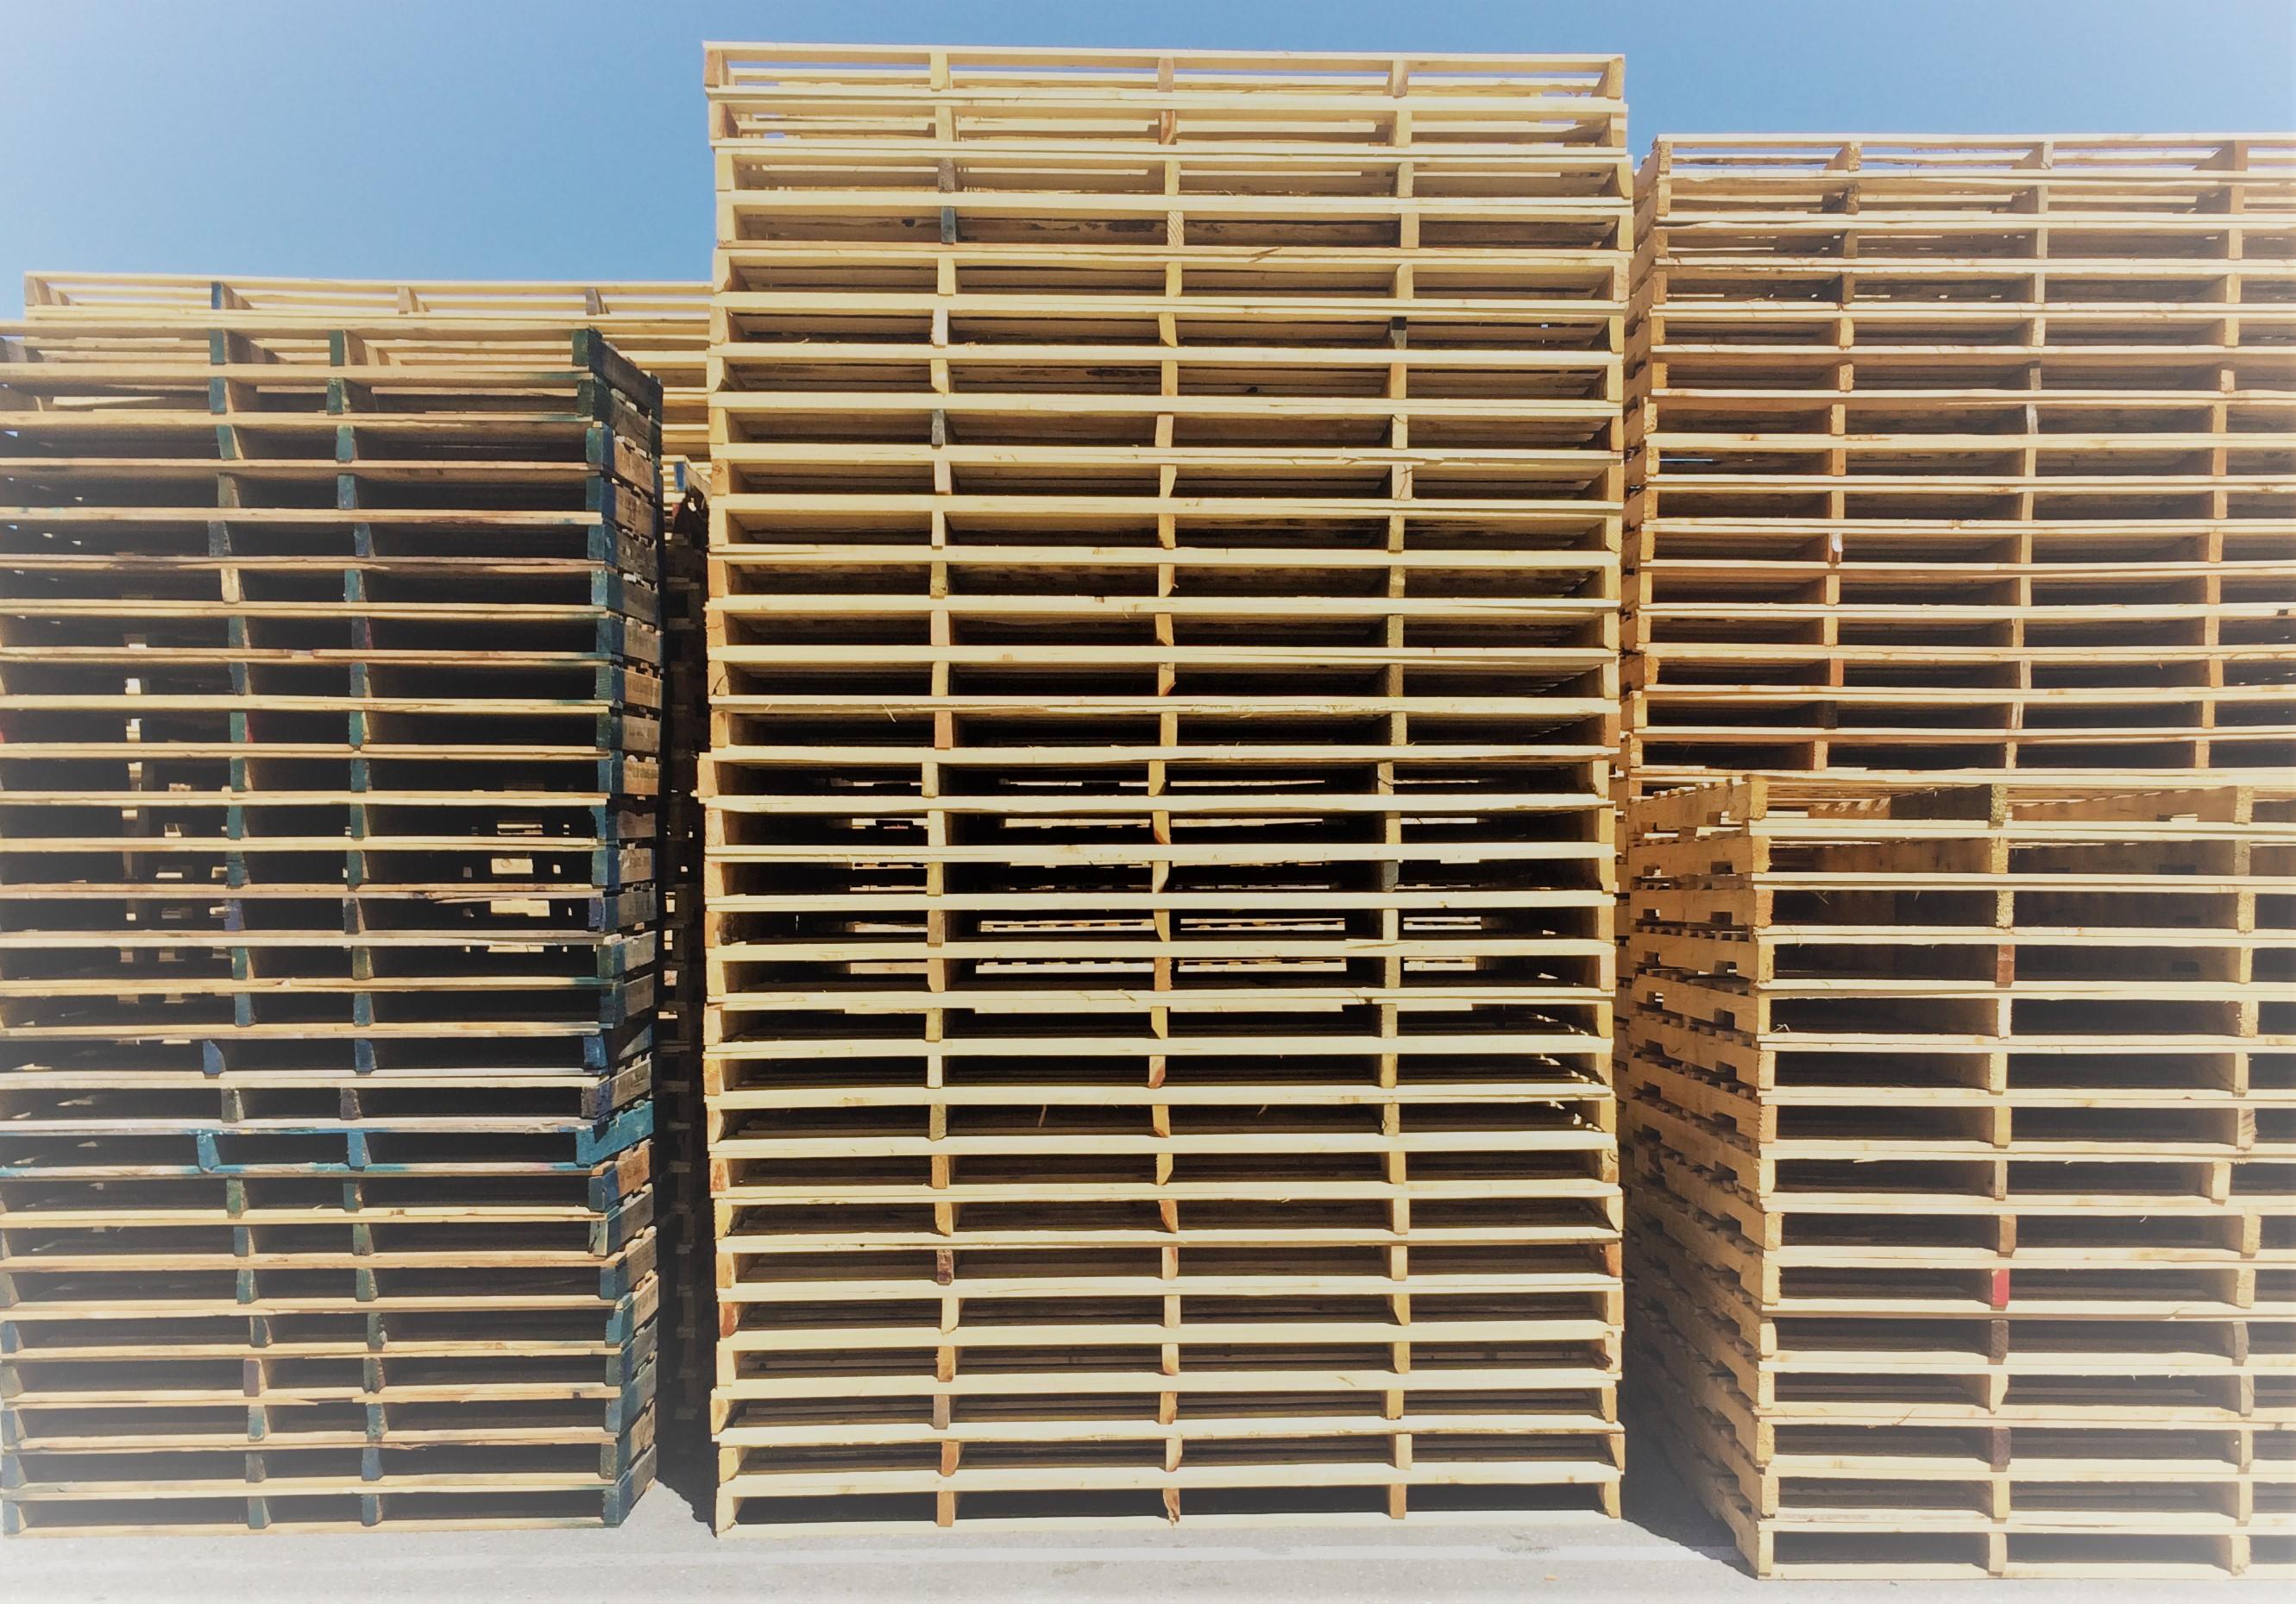 Pallet Inventory Managment